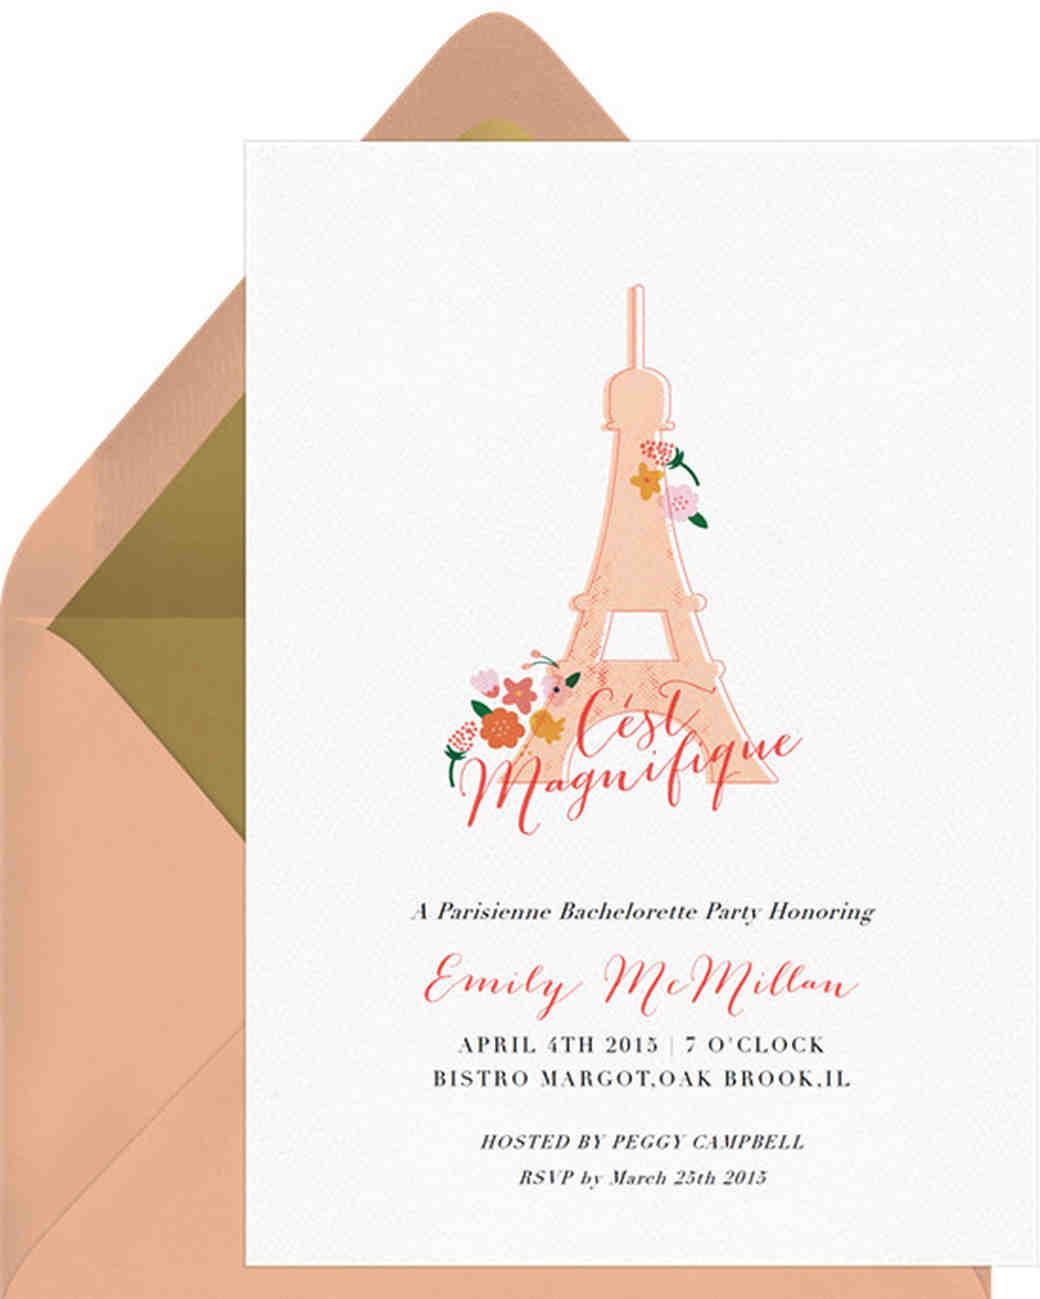 bachelorette party invites greenvelope paris